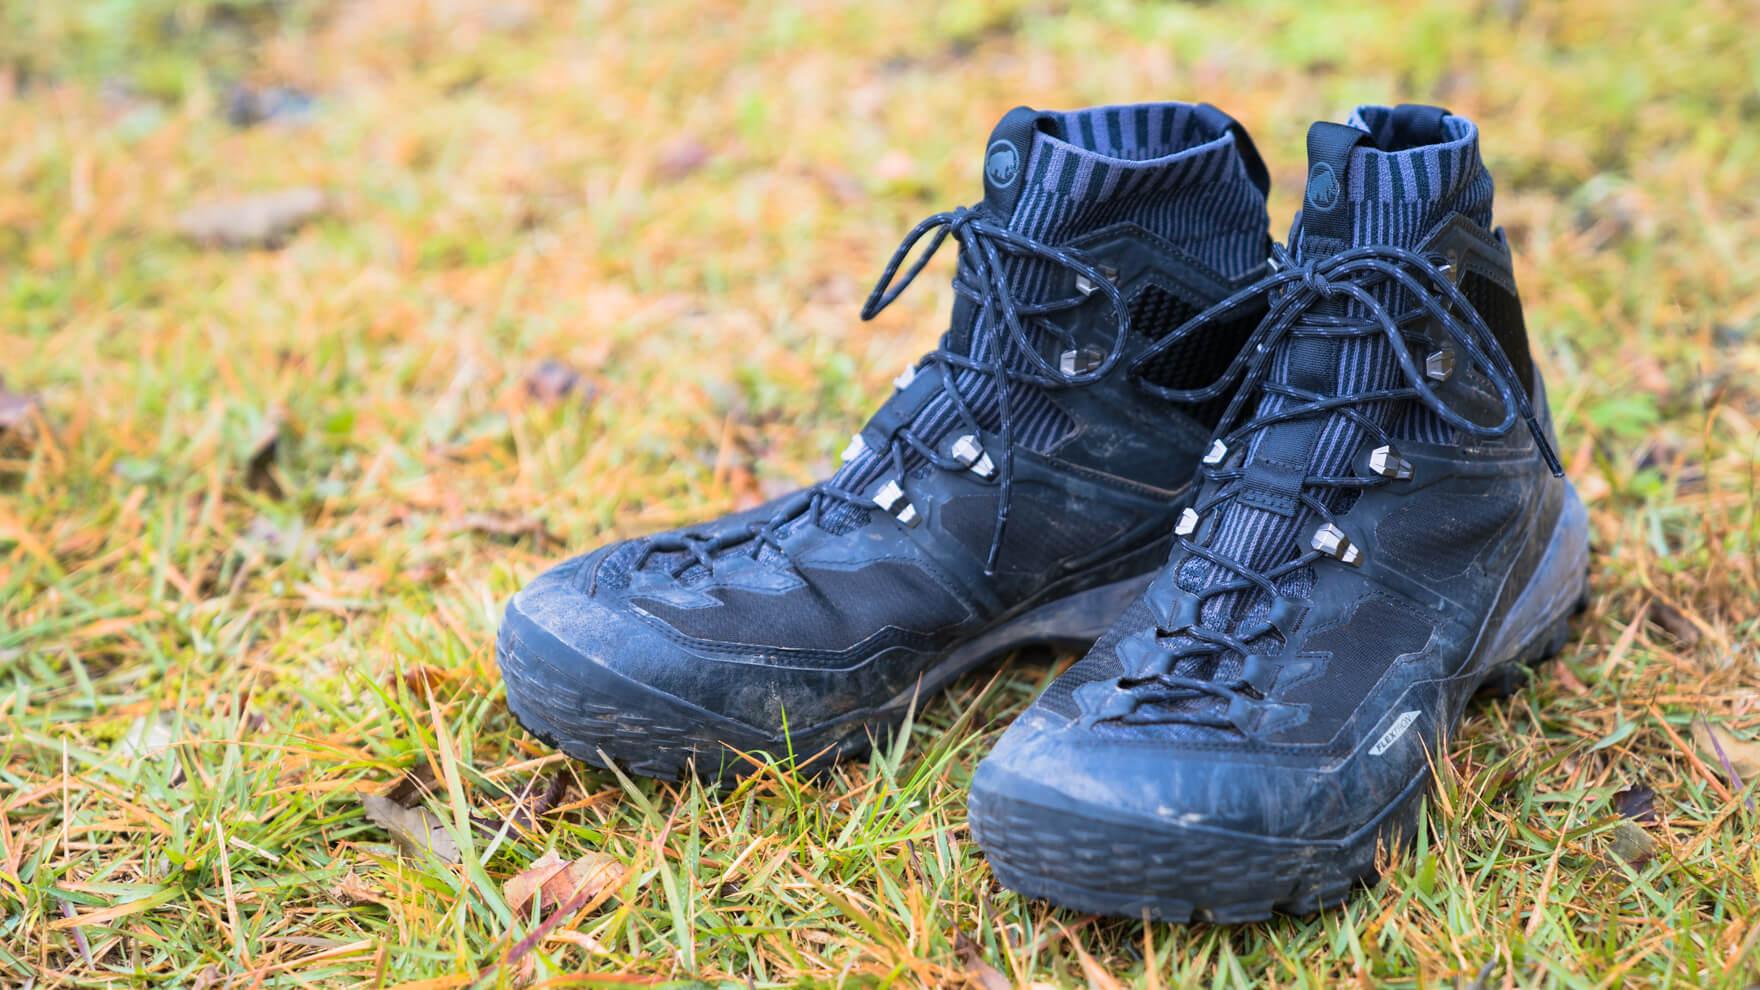 Review:MAMMUT Ducan Knit High GTX これがハイテク登山靴か。堅牢性の中にきらりと光る軽快さと極フィットが絶妙なトレッキングブーツ